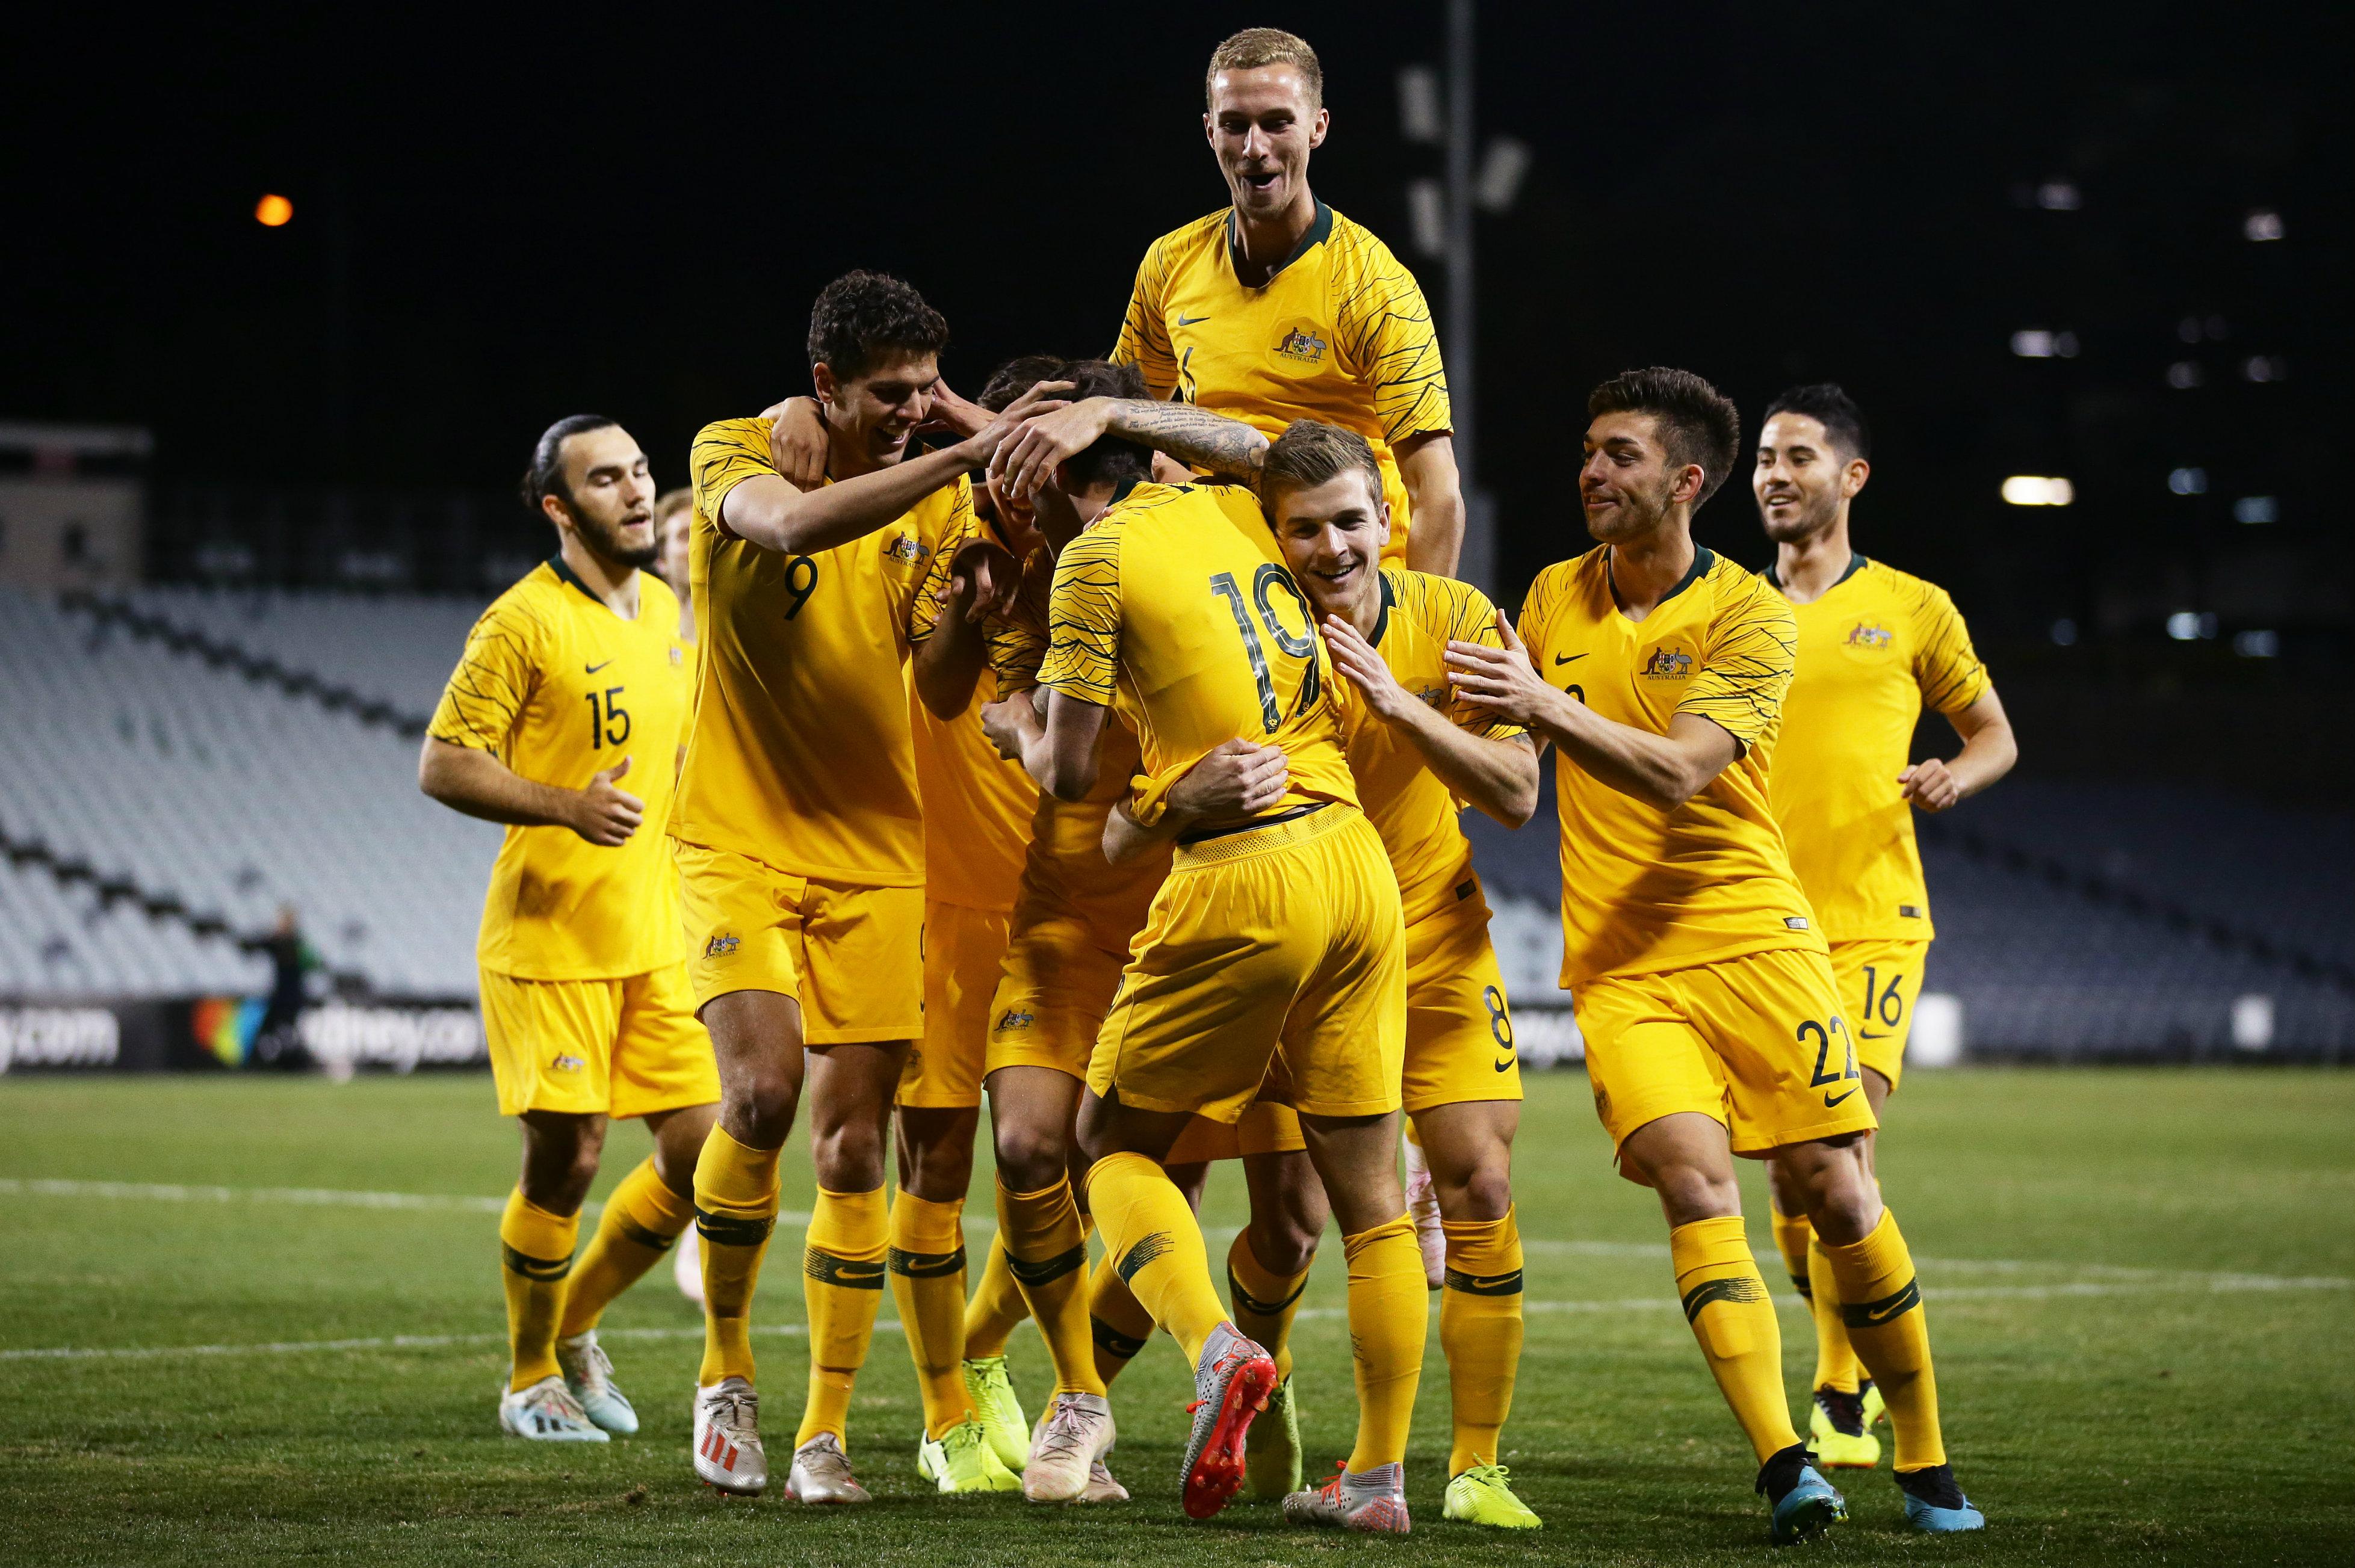 Australia U-23 celebrate